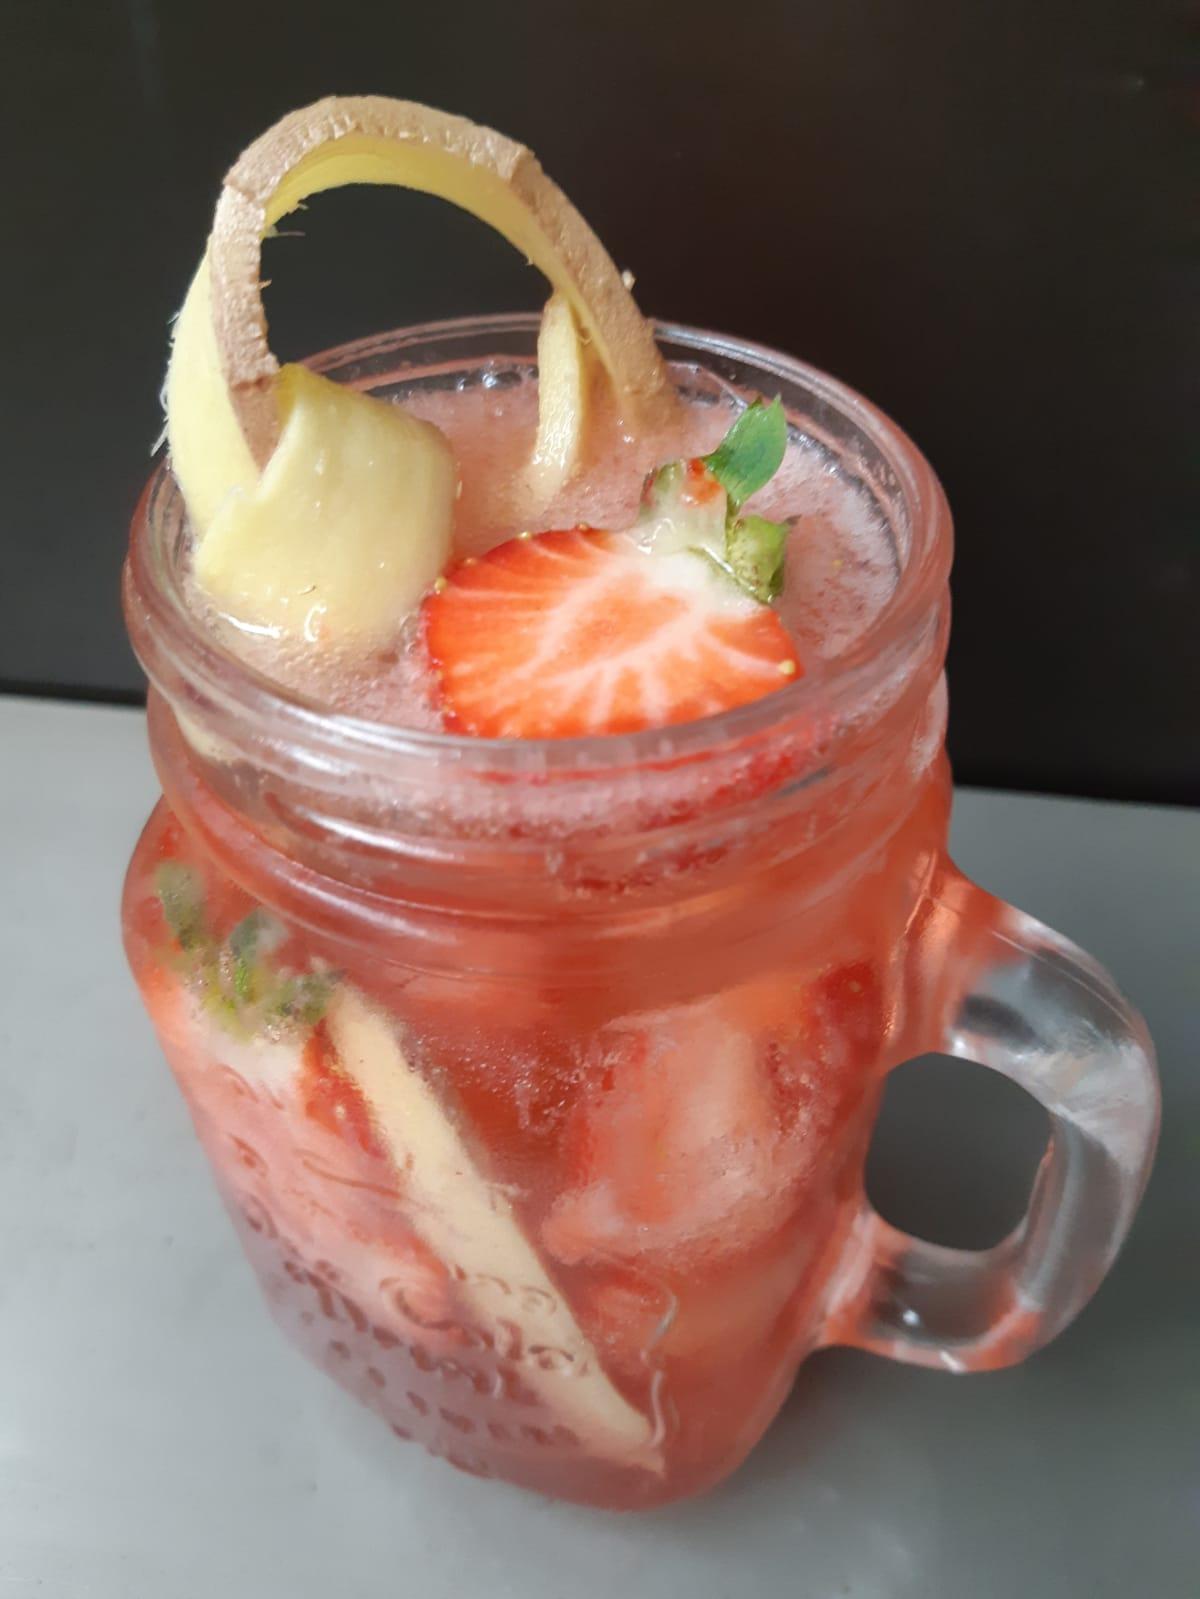 Strawberry Rhubarb Smash cocktail 1.JPG